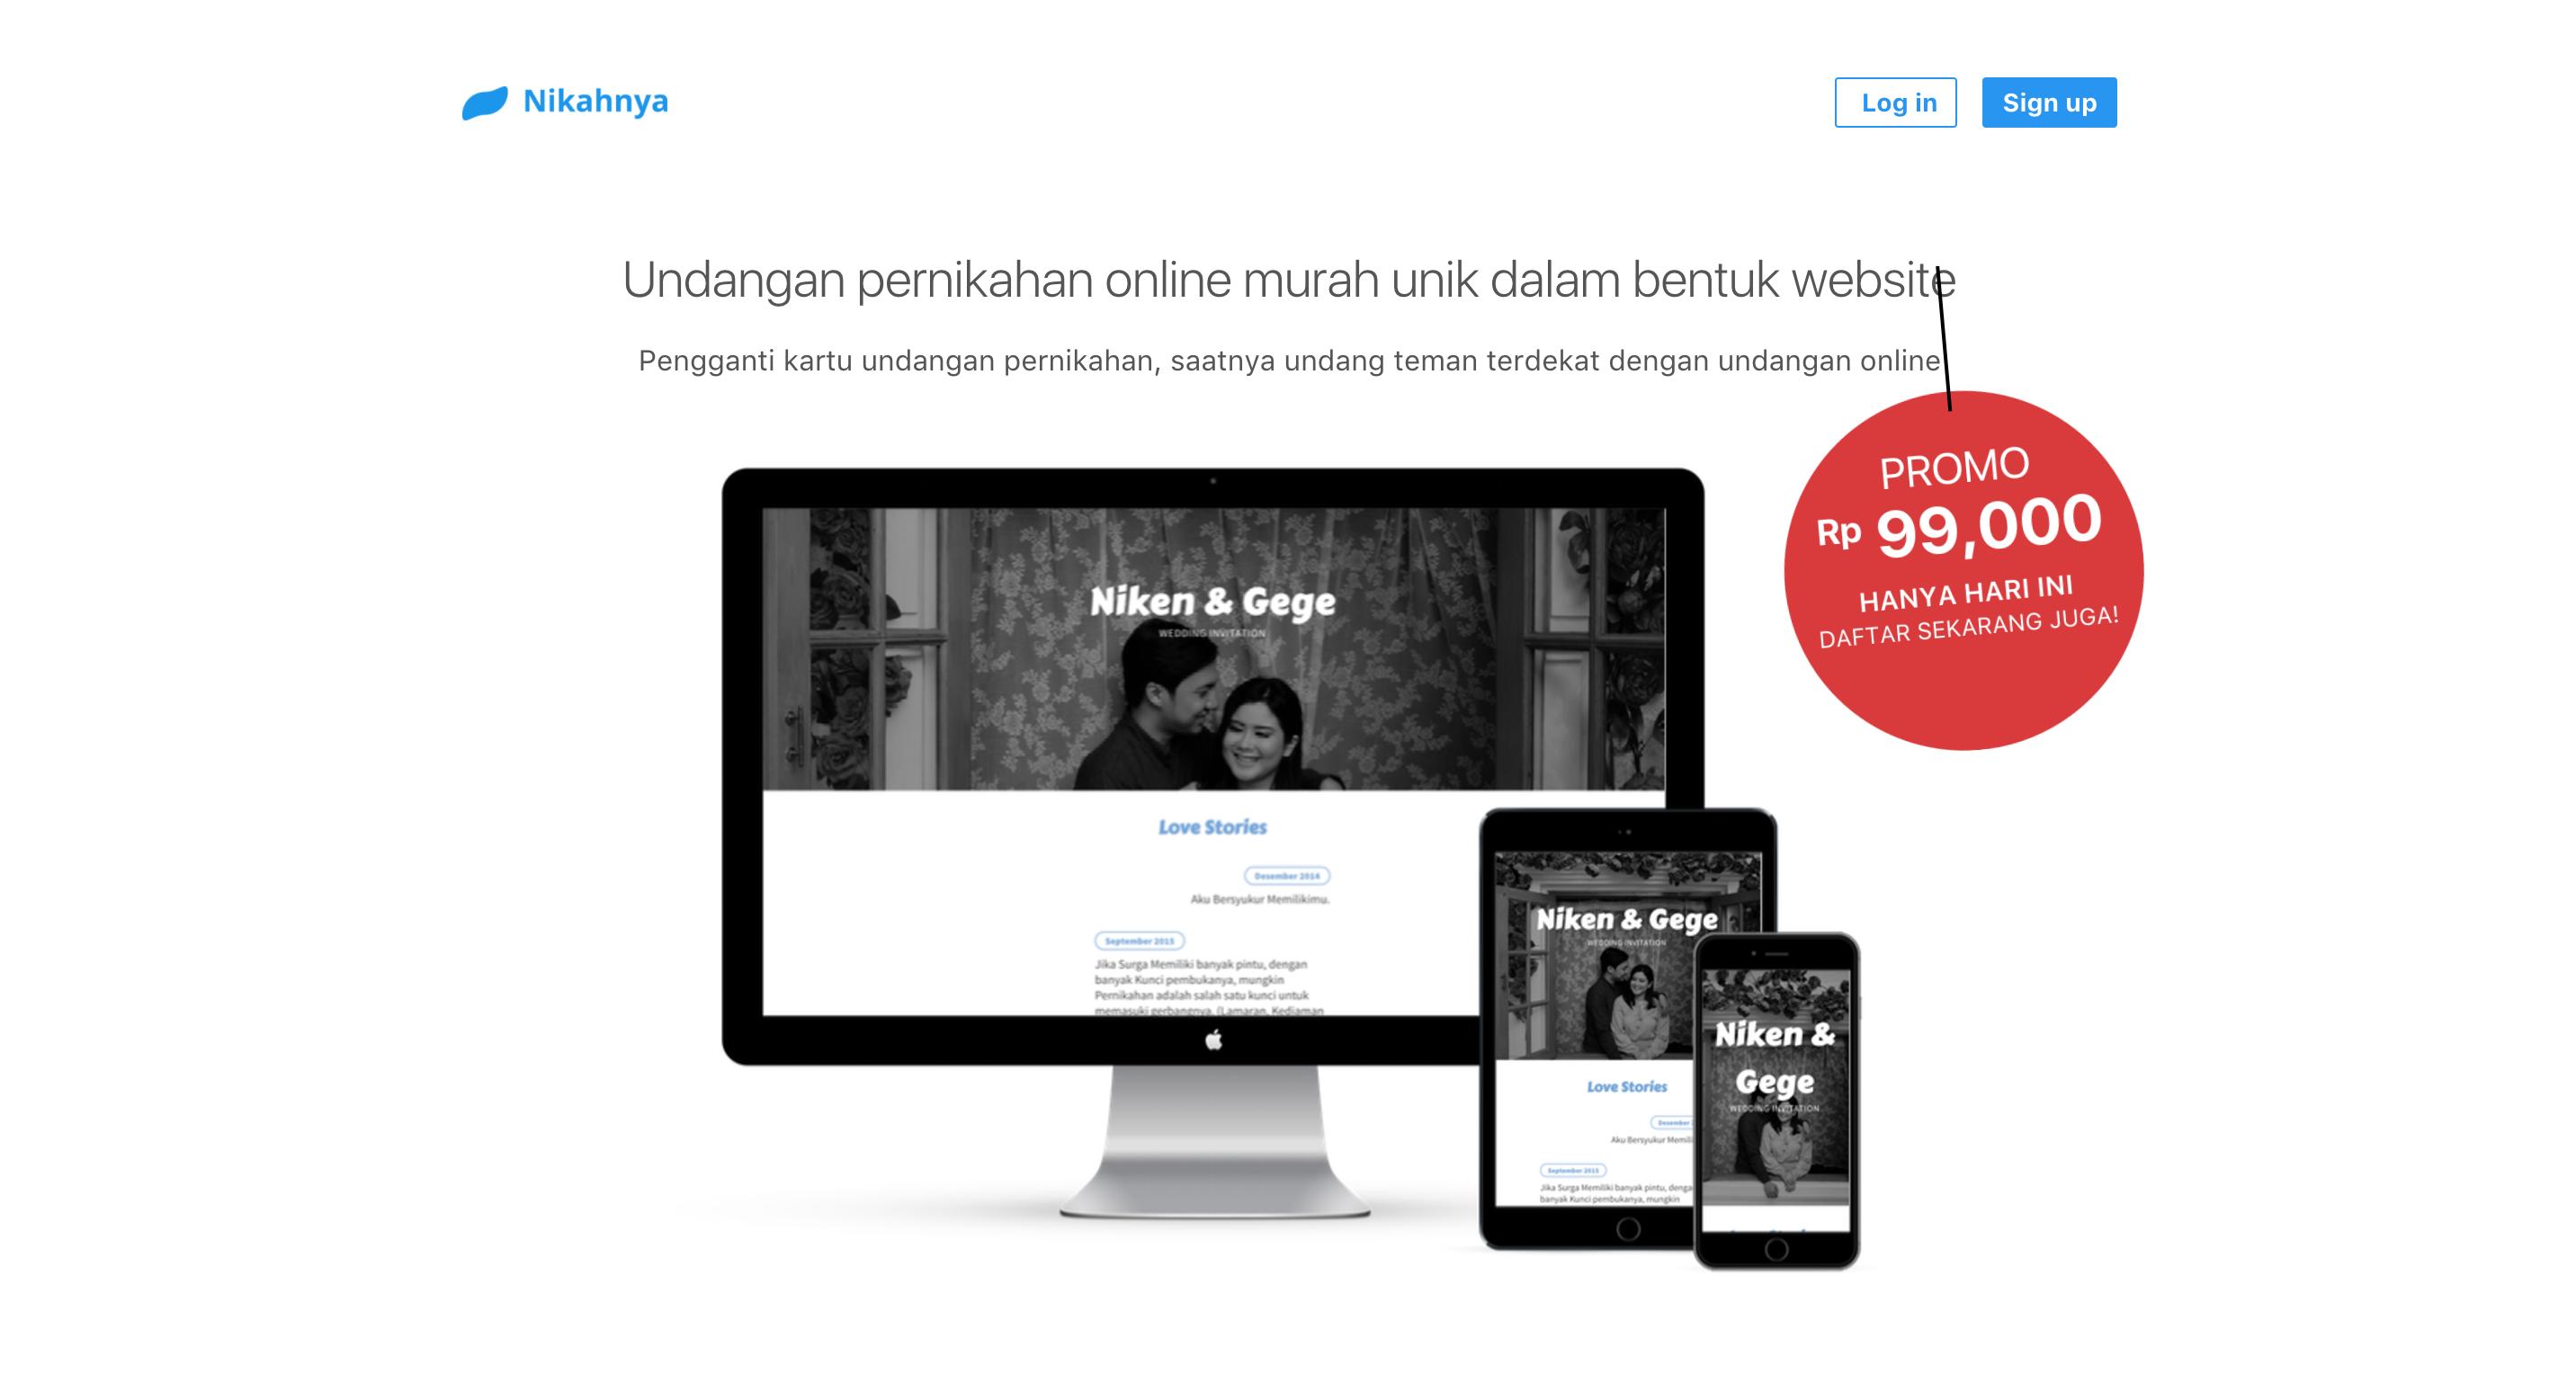 Undangan Online Nikahnya